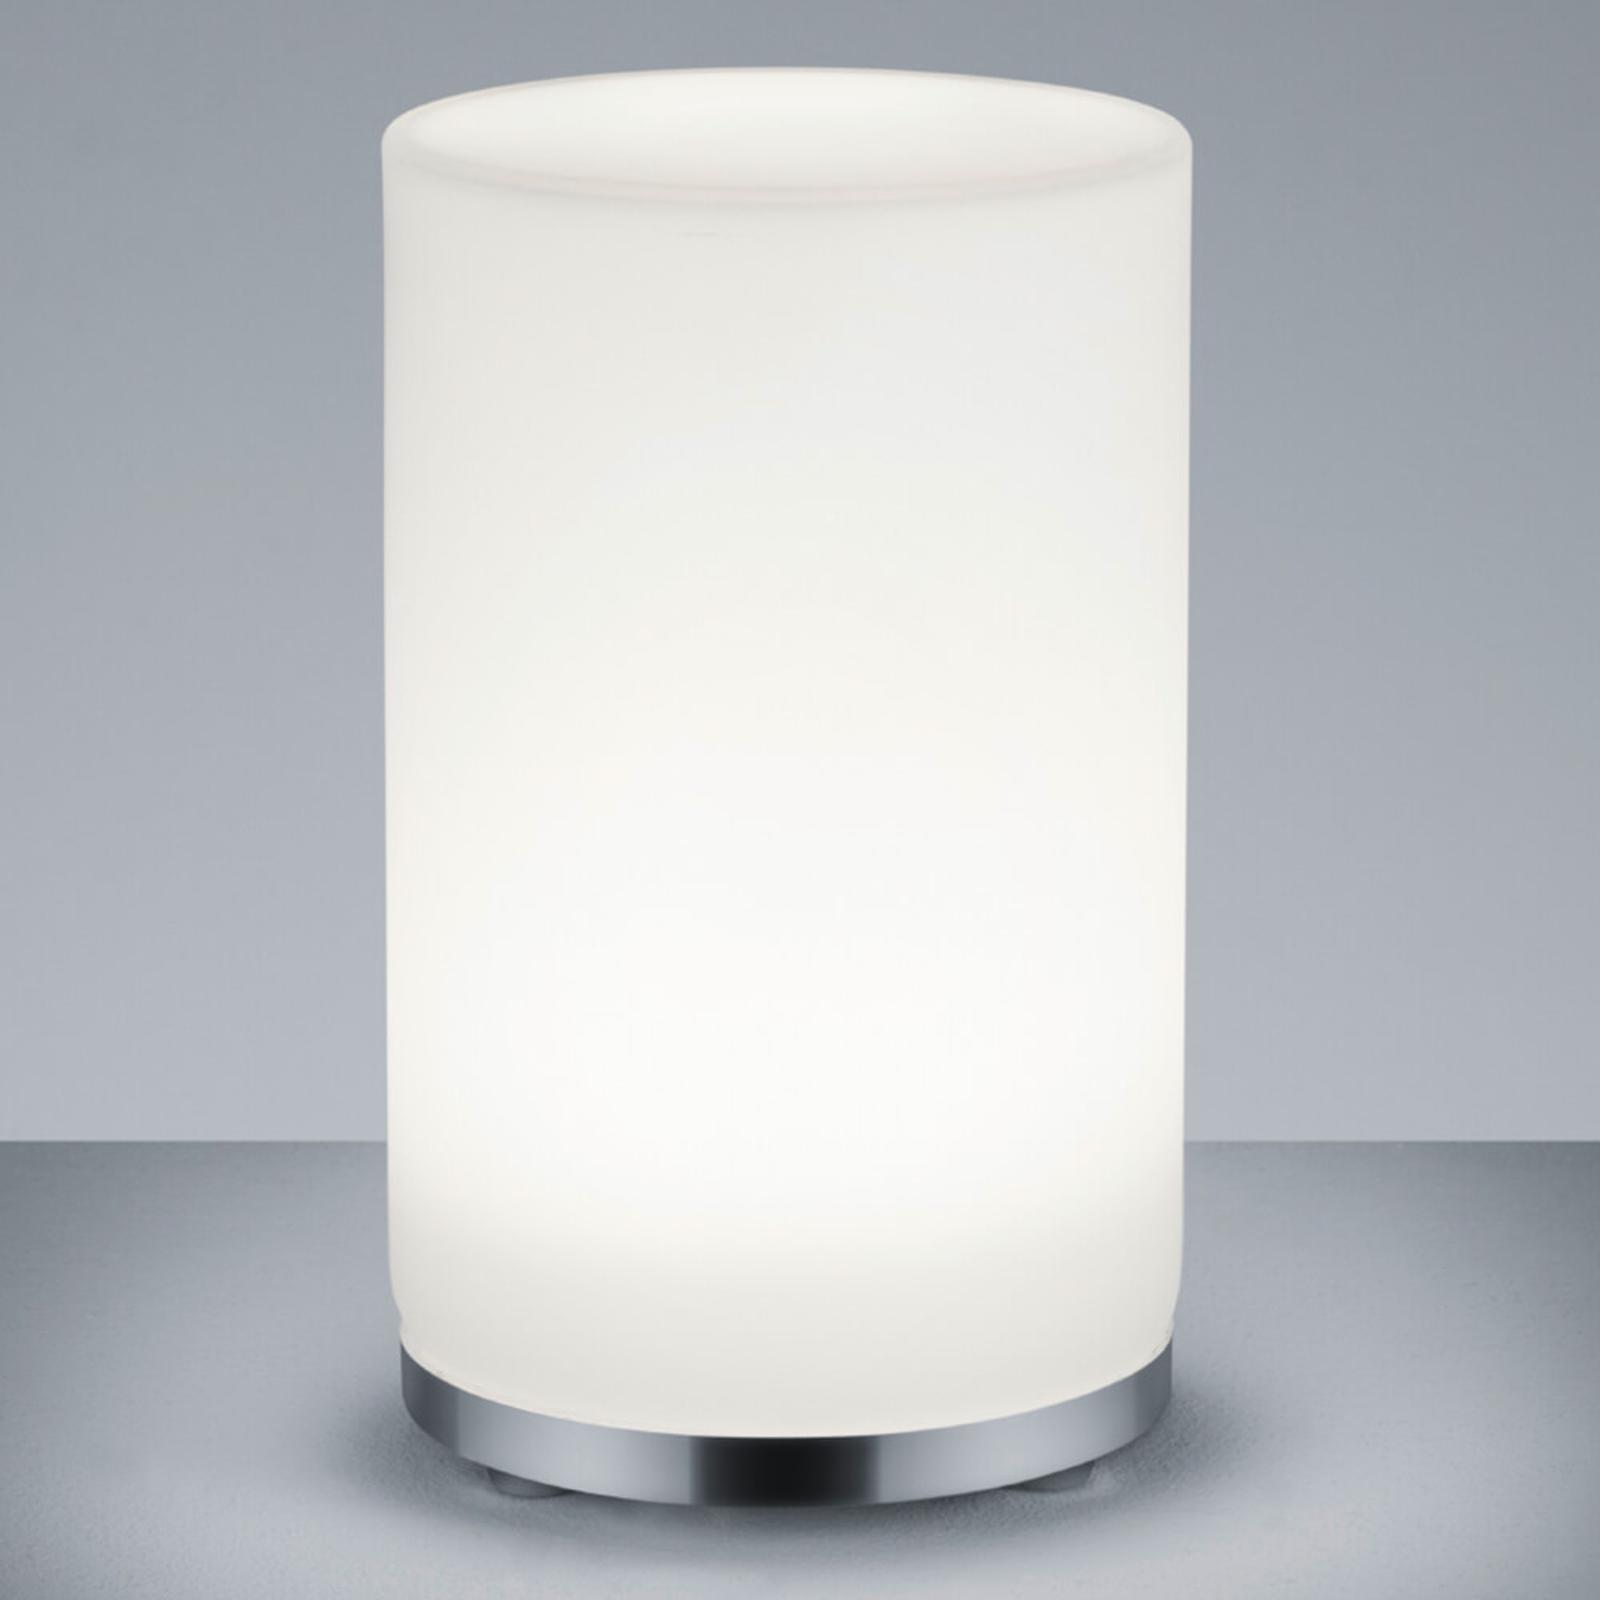 Zylinderförmige RGBW-LED-Tischleuchte John m. FB